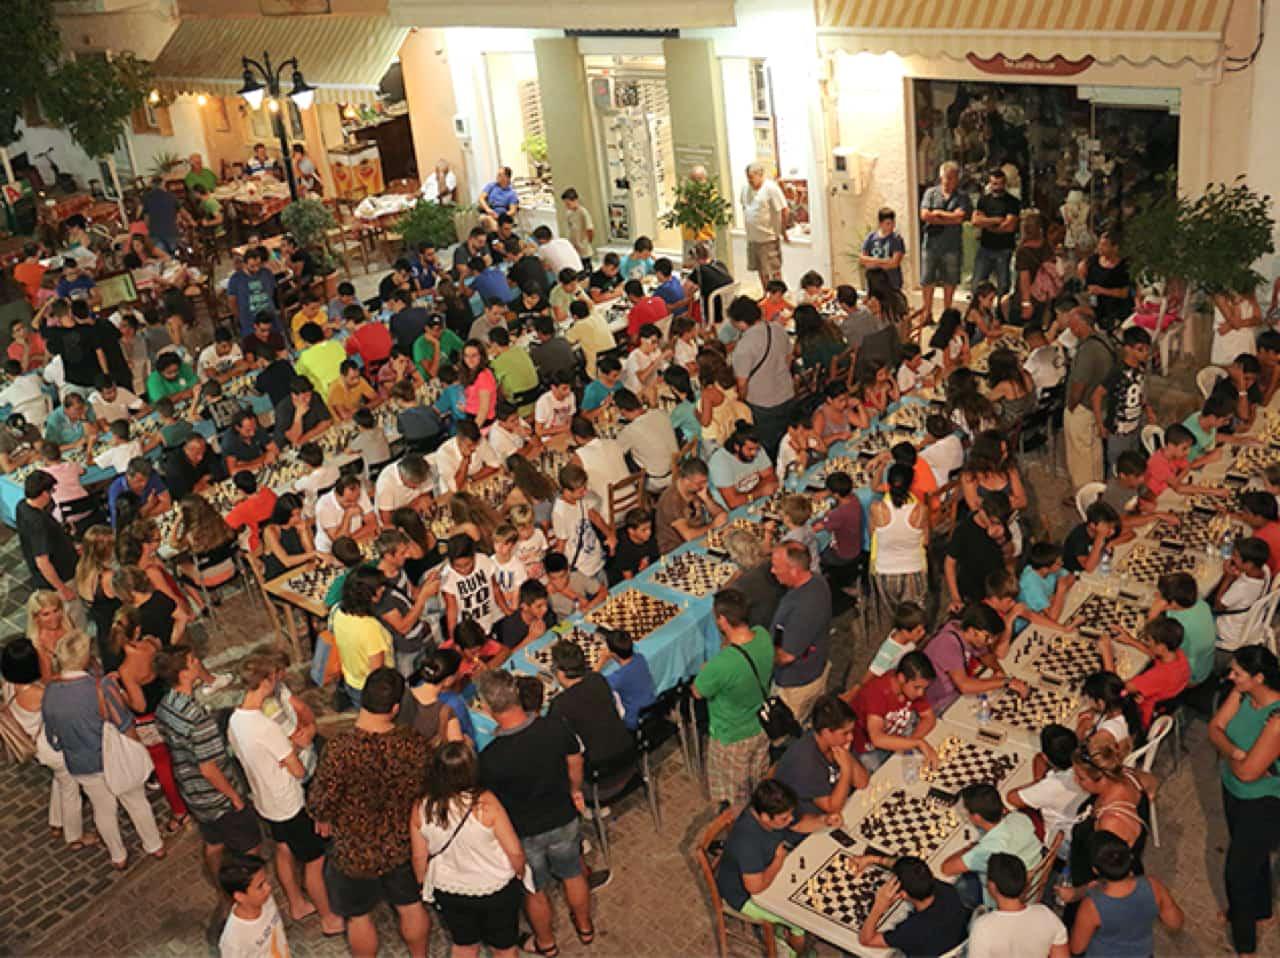 International Chess Tournament of Paleochora Village, events paleochora village, things to do paleochora village, chess tournament paleohora village, activities paleochora village